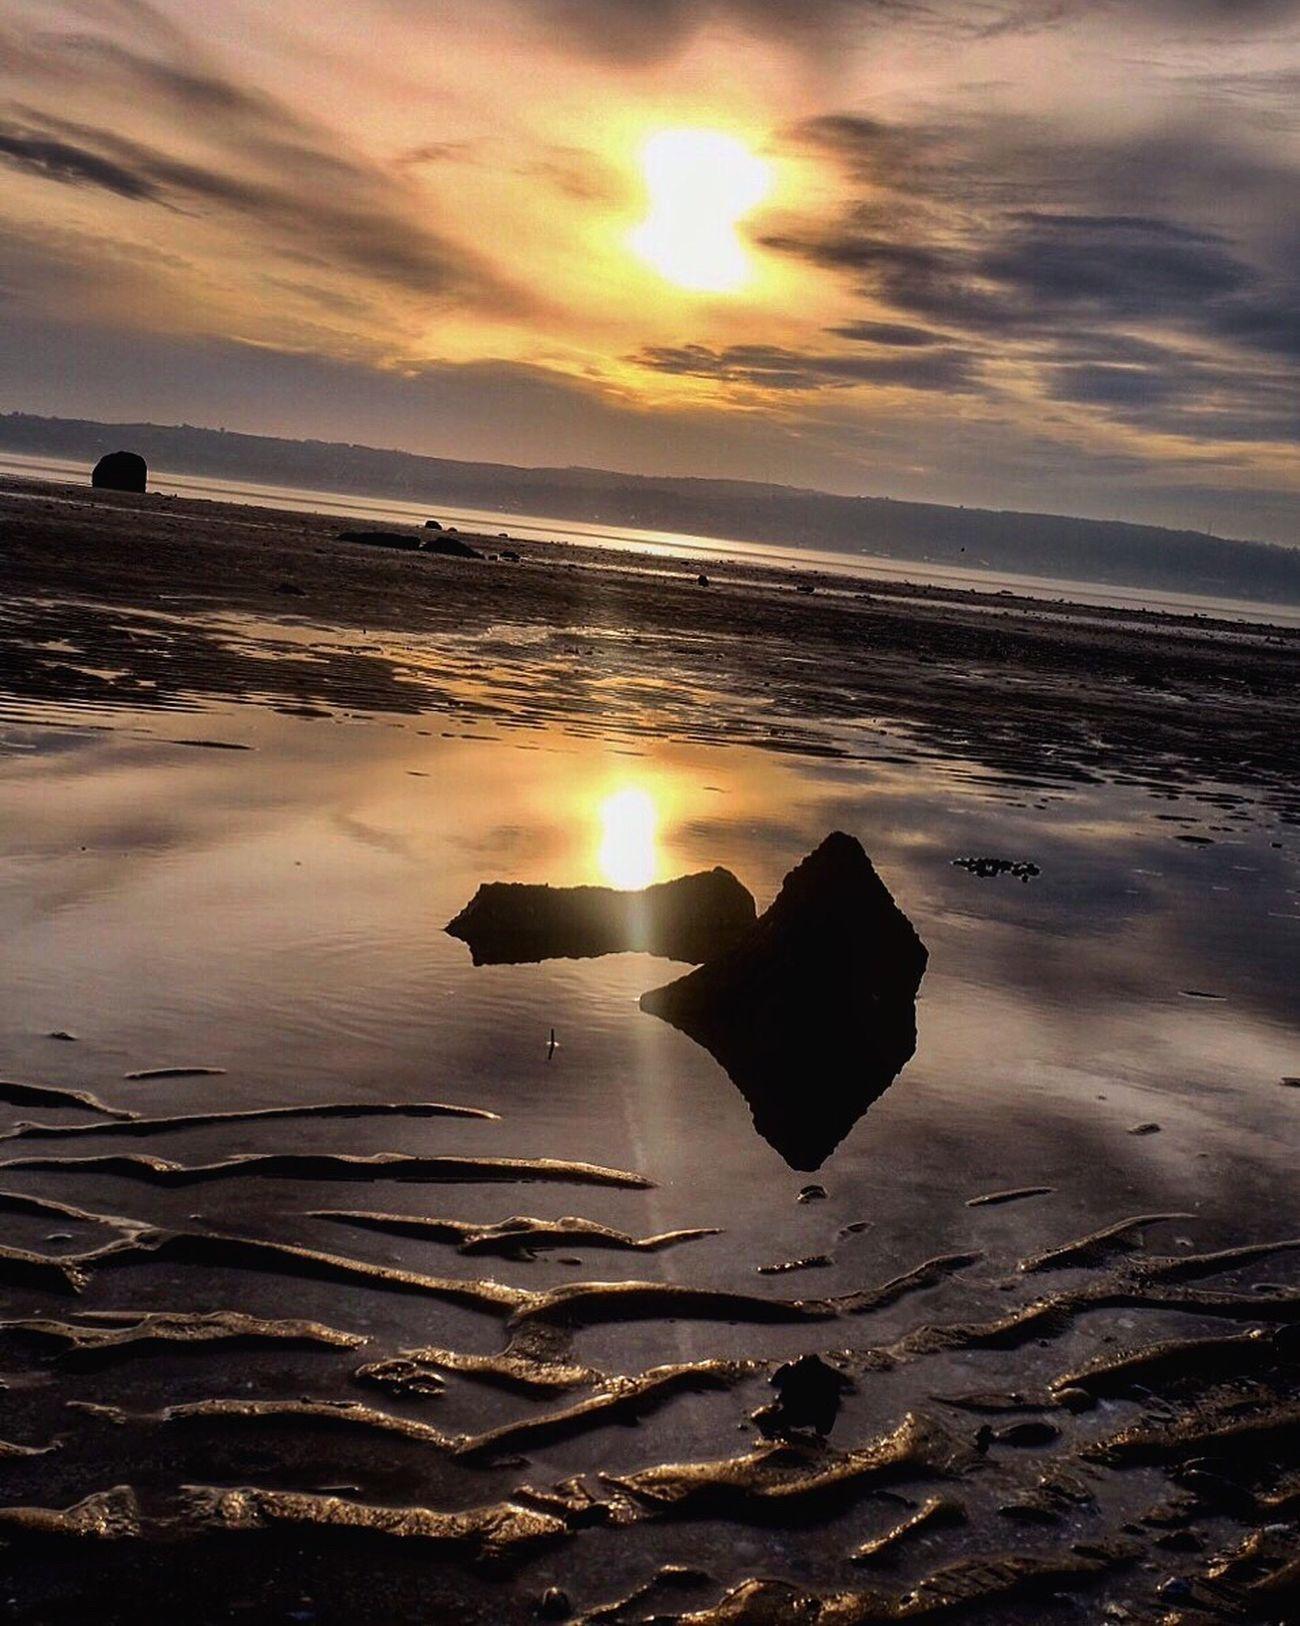 Sunset Water Beauty In Nature Nature Sea Scenics Tranquility Sun Beach Tranquil Scene Sky Myfujifilm Fujifilm_xseries Idyllic No People Outdoors Cloud - Sky Horizon Over Water Sand Dramatic Sky Sunbeam